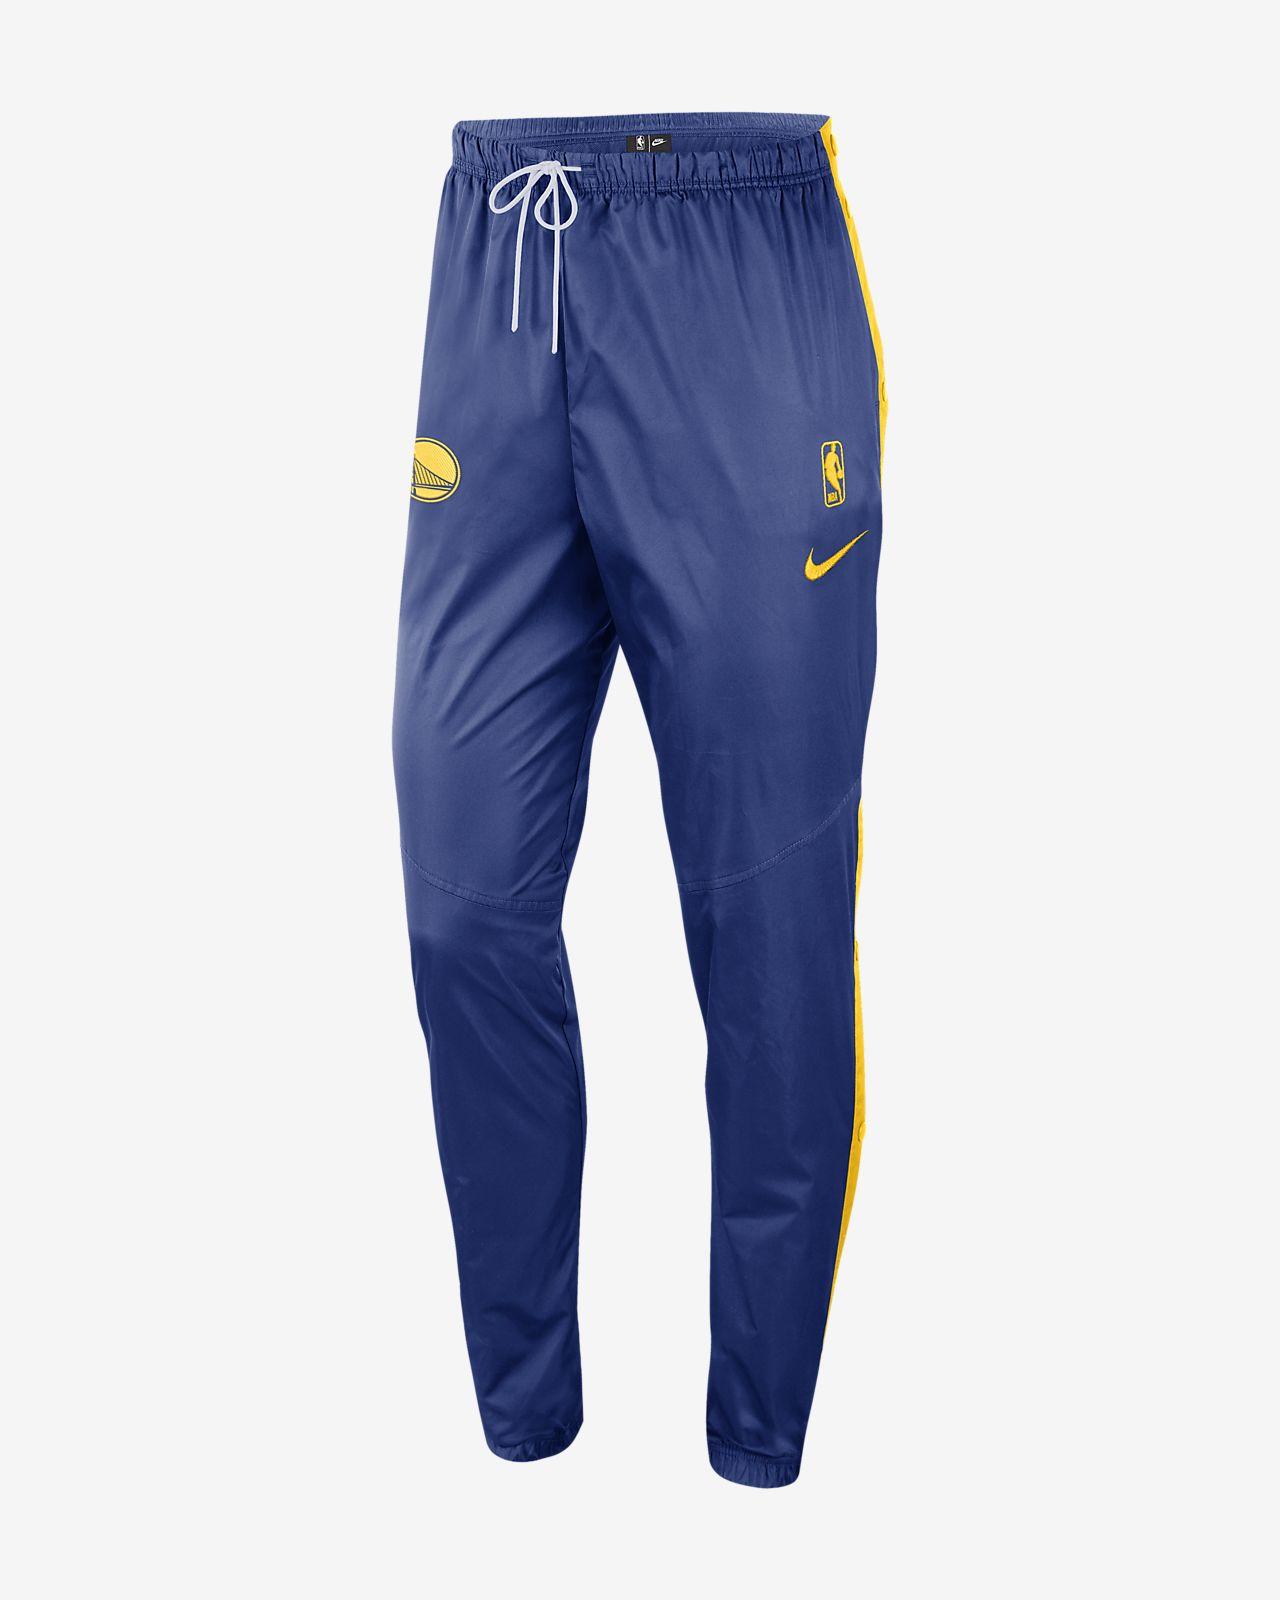 Golden State Warriors Nike Women's NBA Trousers